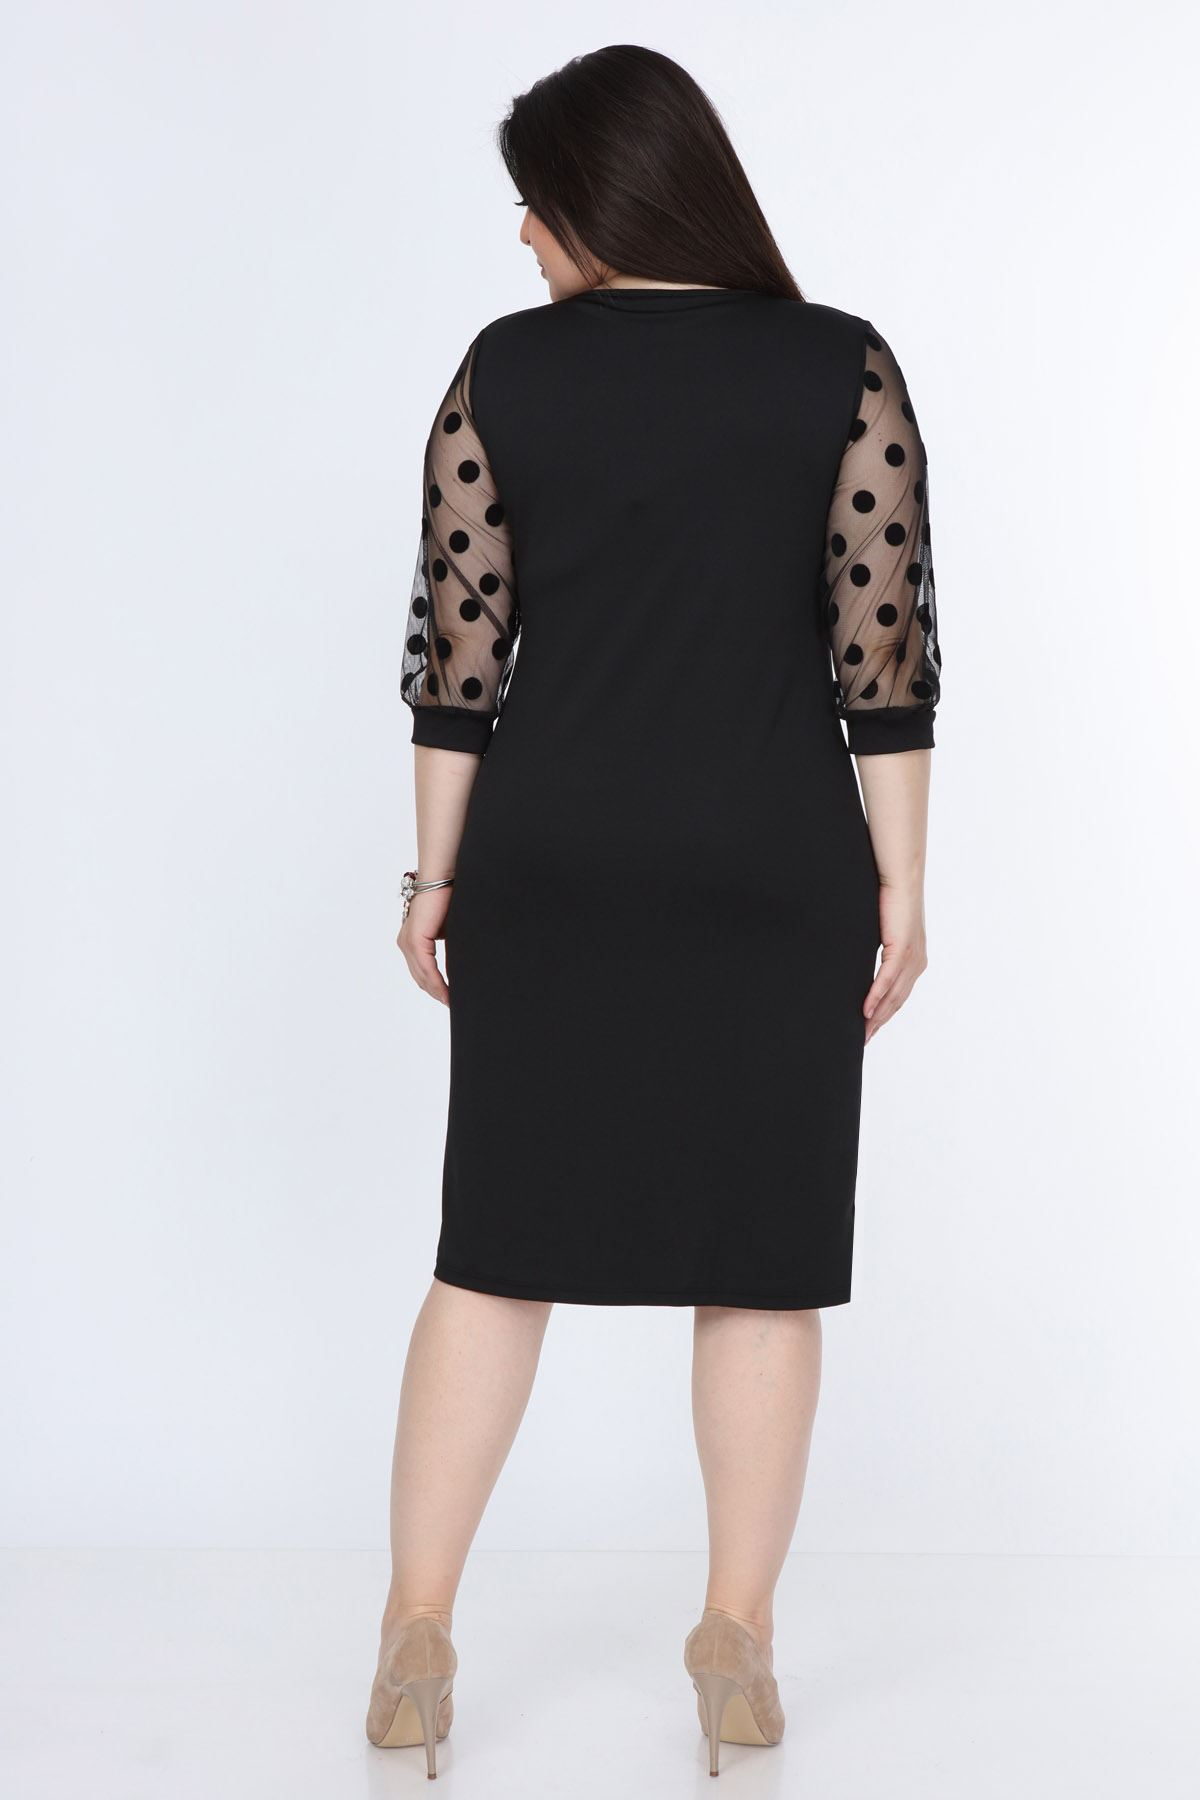 Puanlı Flok Kol Büyük Beden Elbise 12E-08951